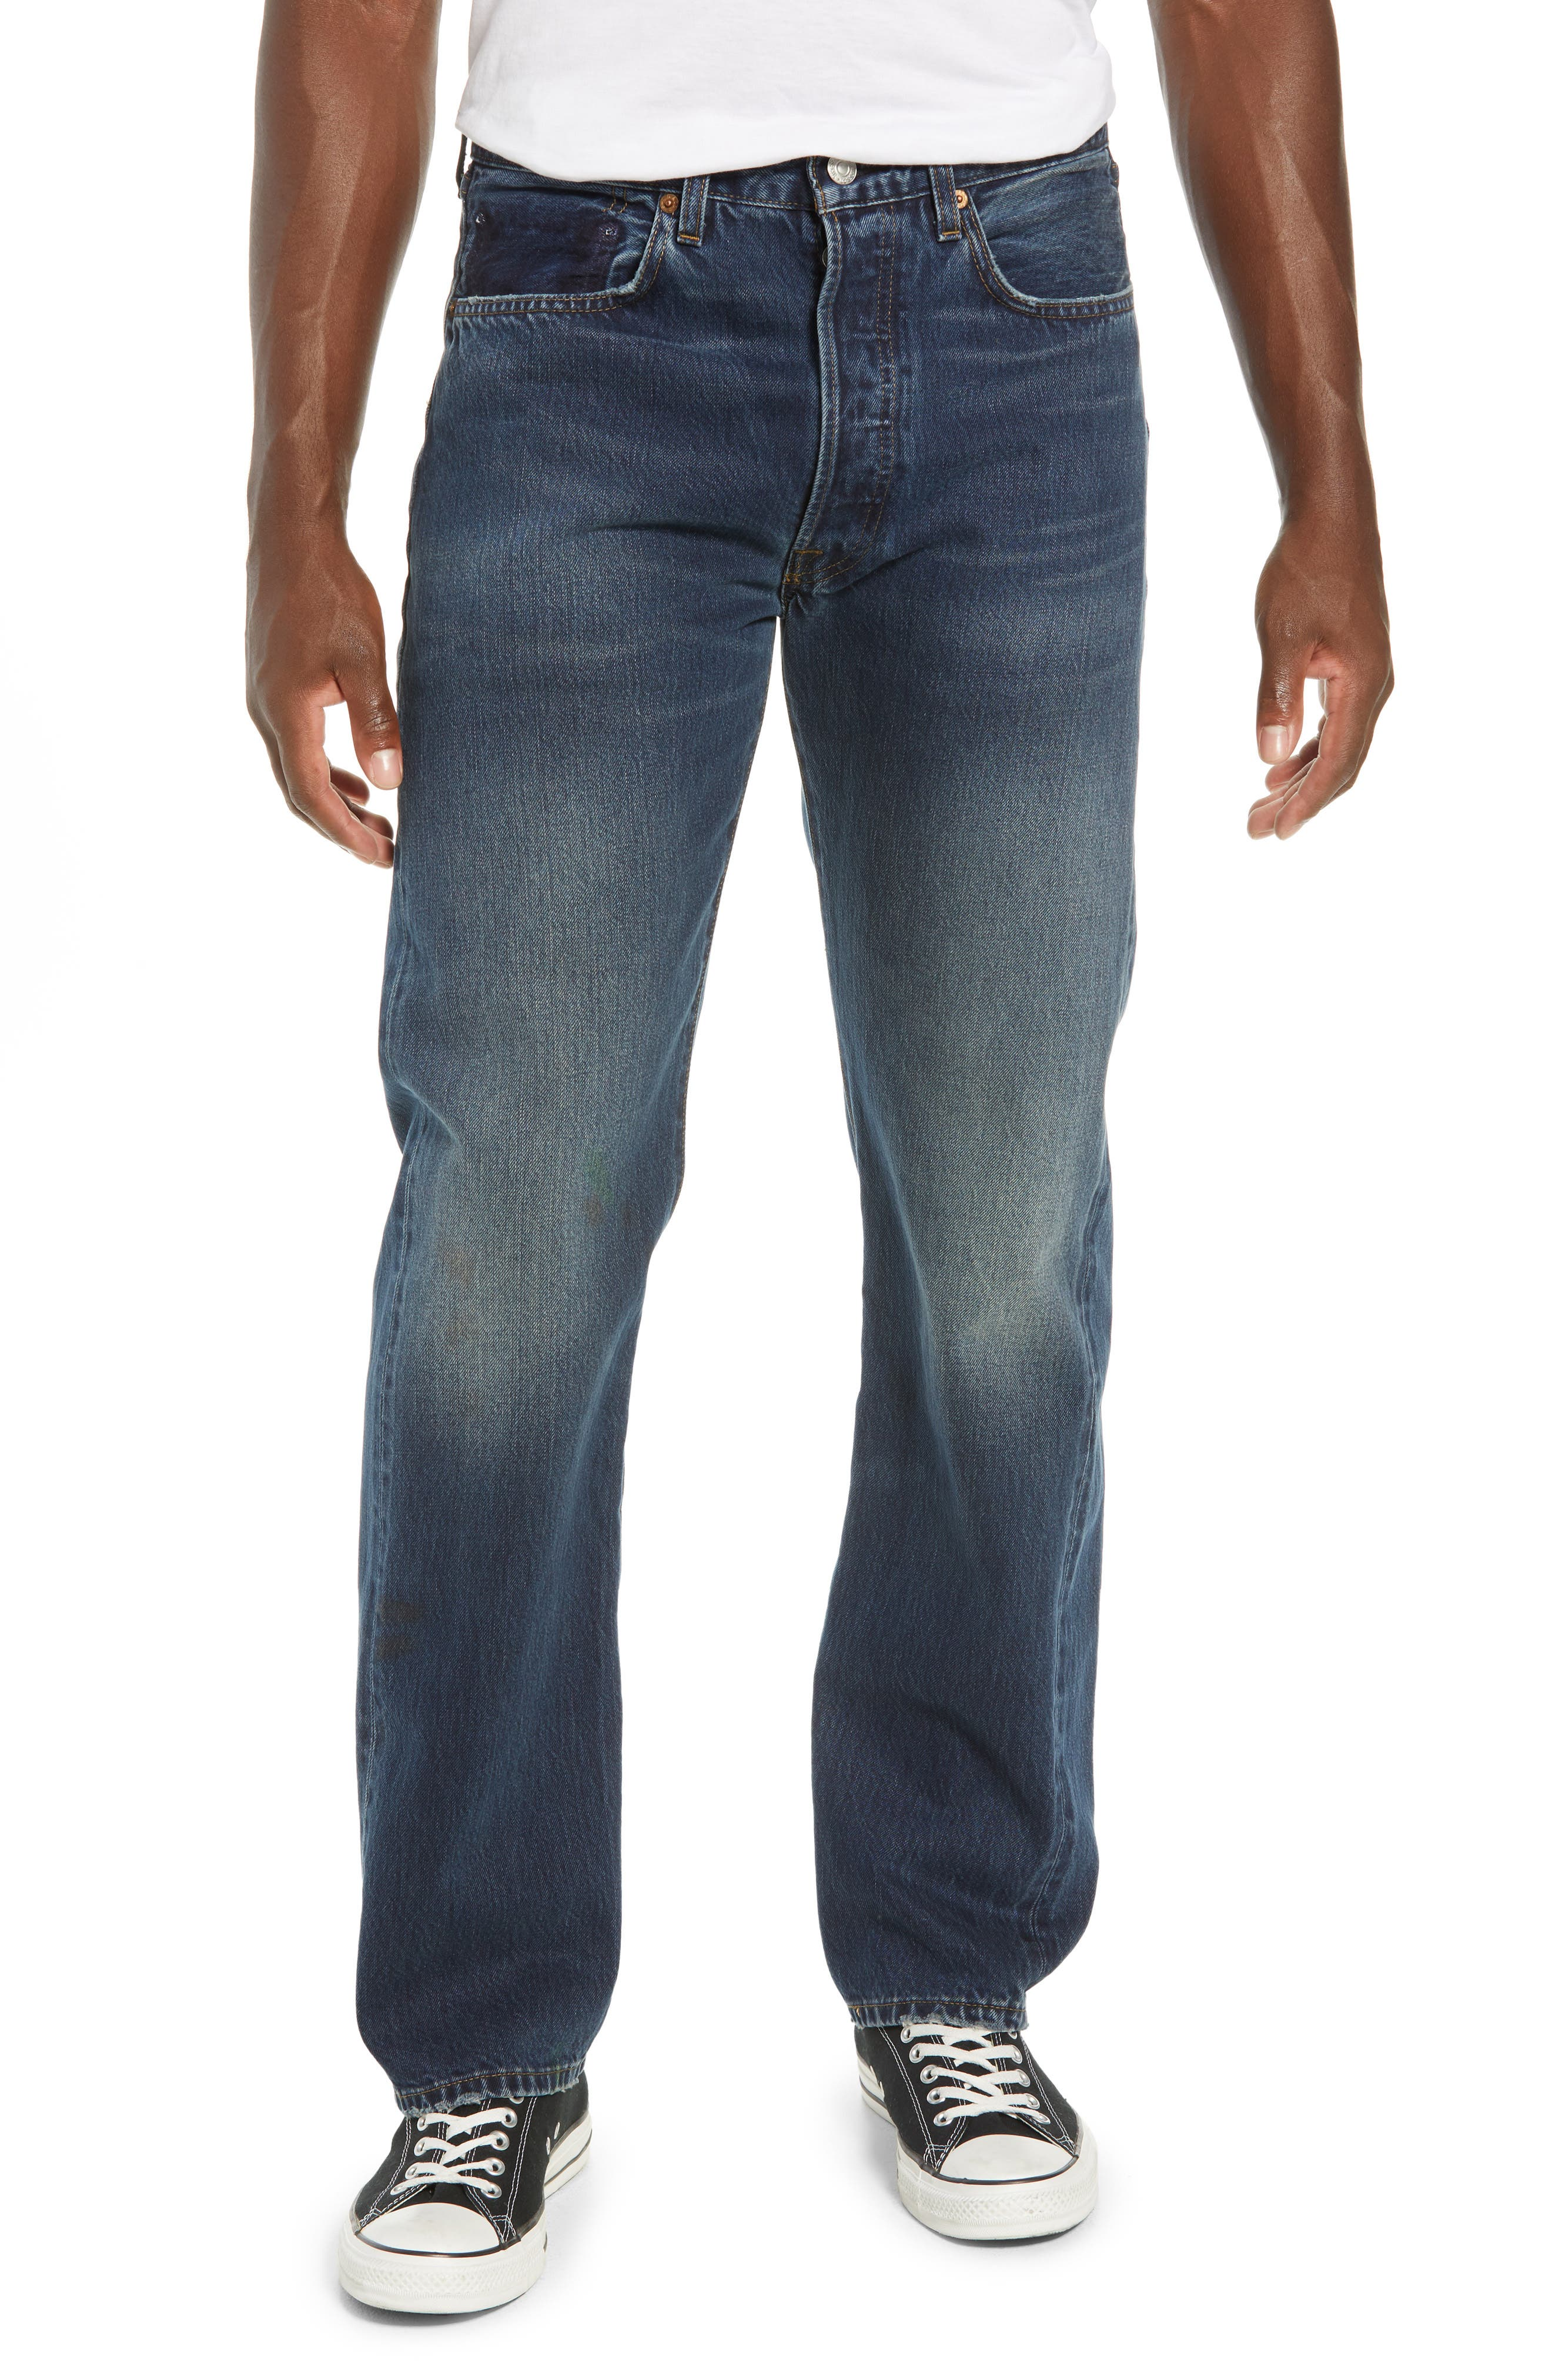 Levi's<sup>®</sup> 1967 501<sup>®</sup> Slim Fit Jeans,                         Main,                         color, 402